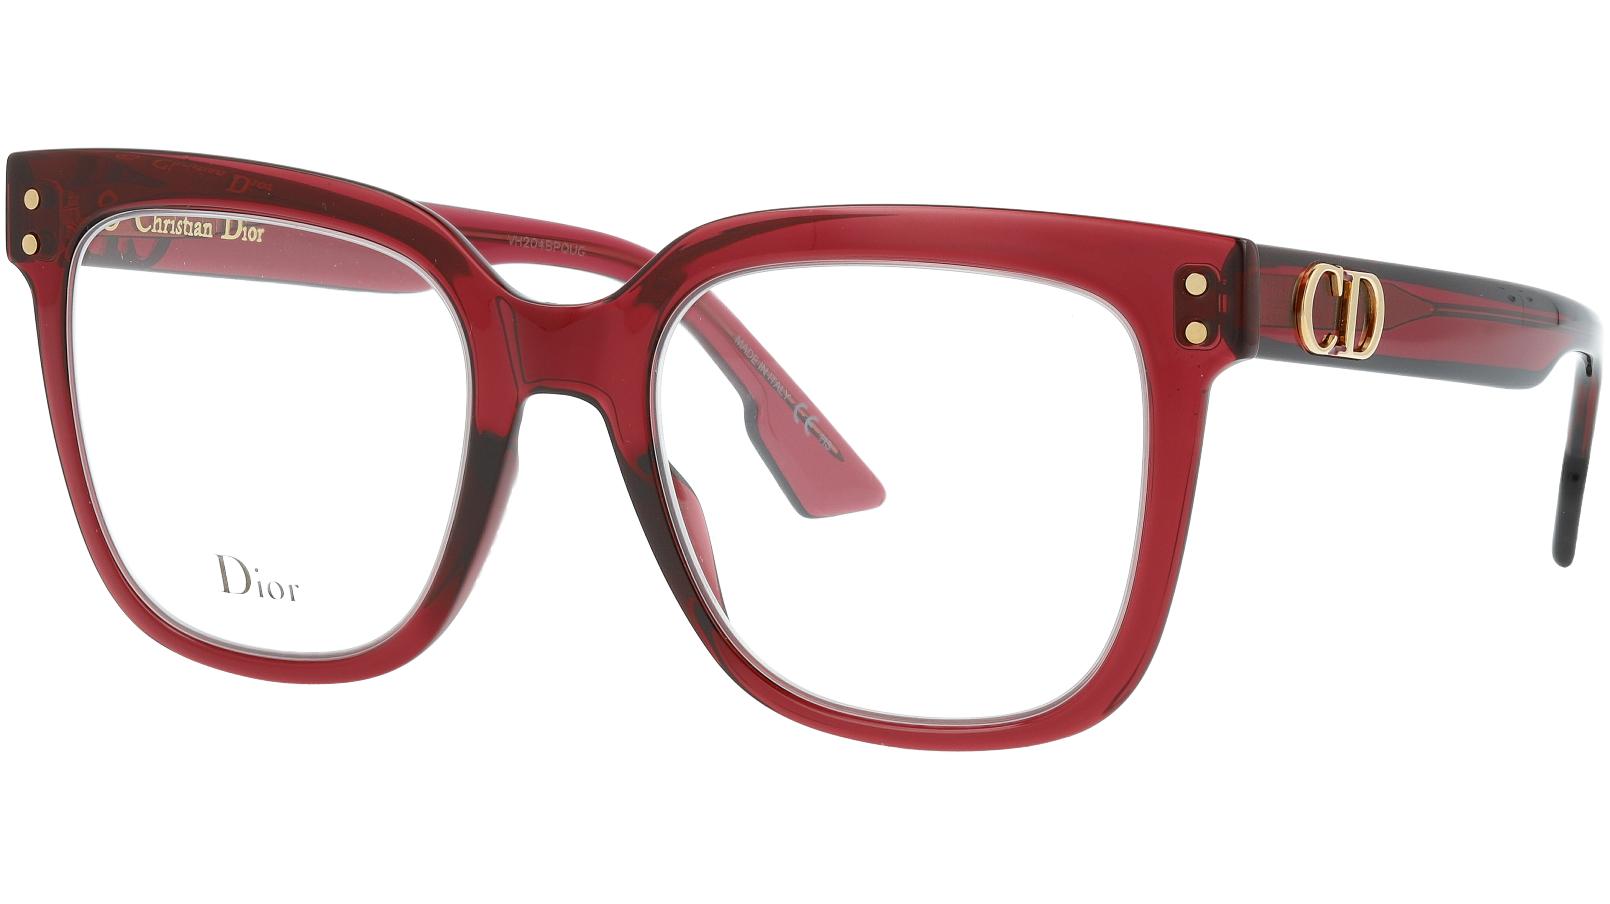 Dior CD1 LHF 50 BurgunD Glasses